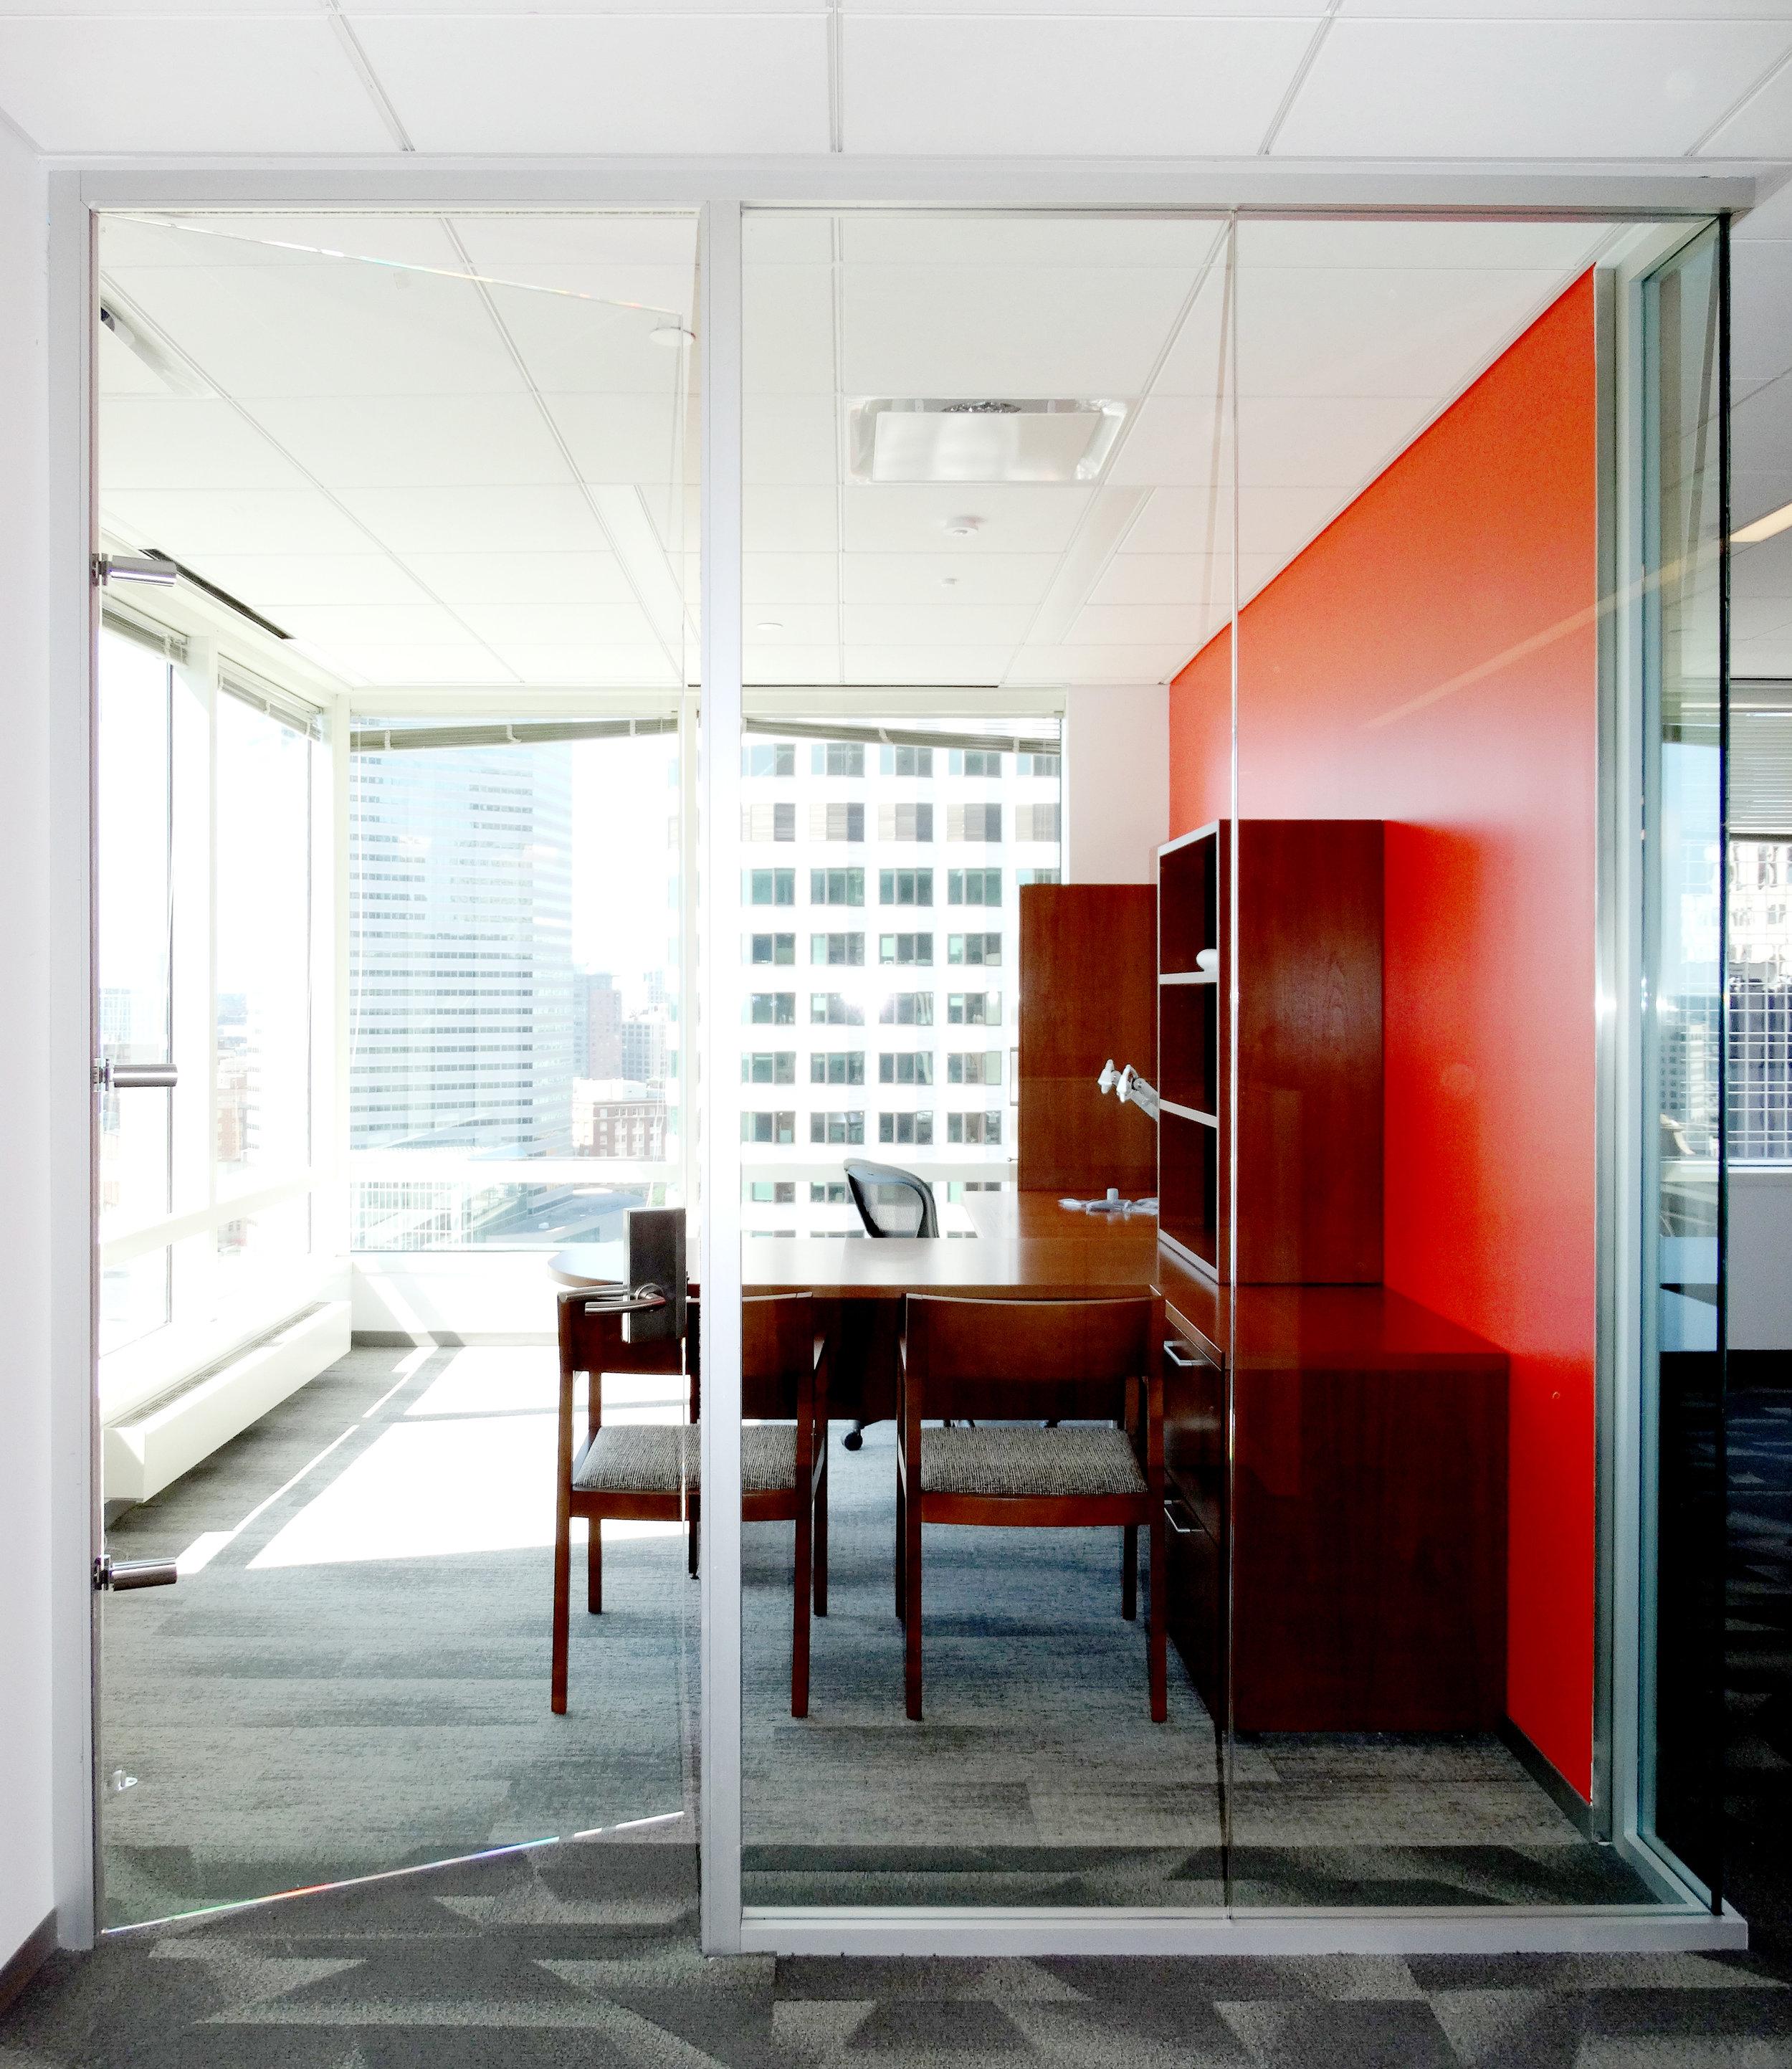 Litespace Frameless Glass Office Aluminum Demountable System Narrow - Spaceworks AI.jpg